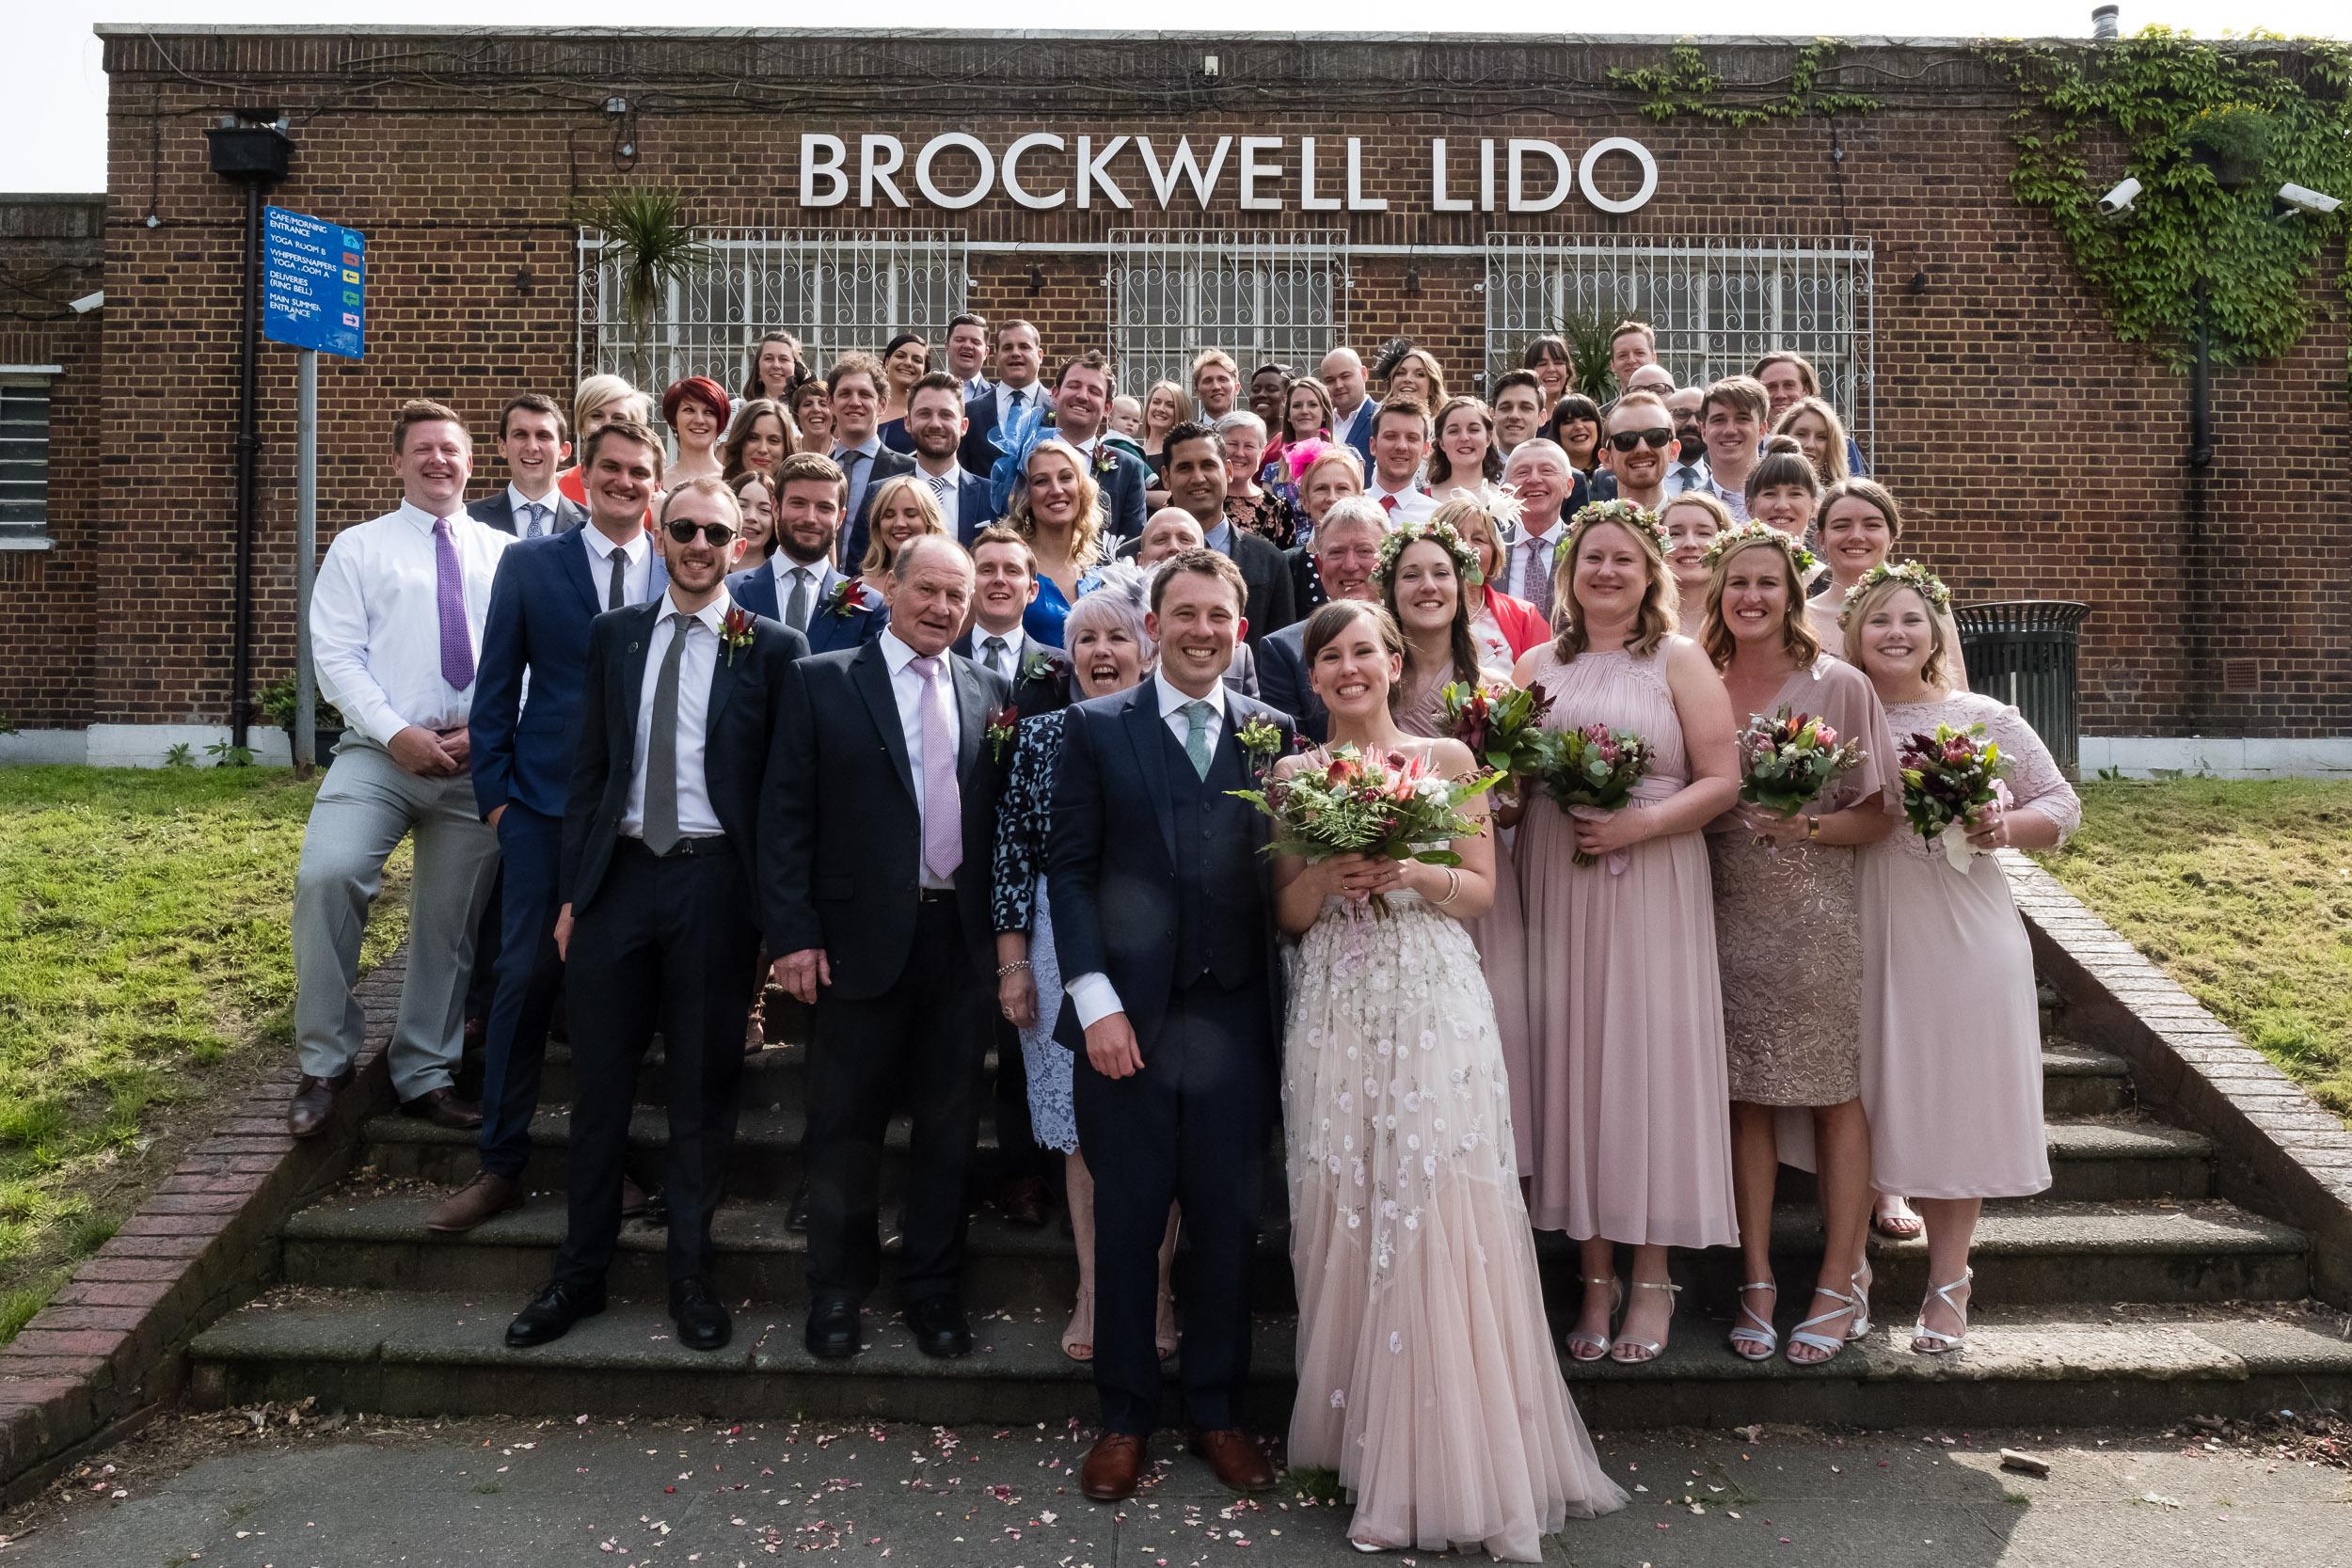 brockwell-lido-brixton-herne-hill-wedding-222.jpg